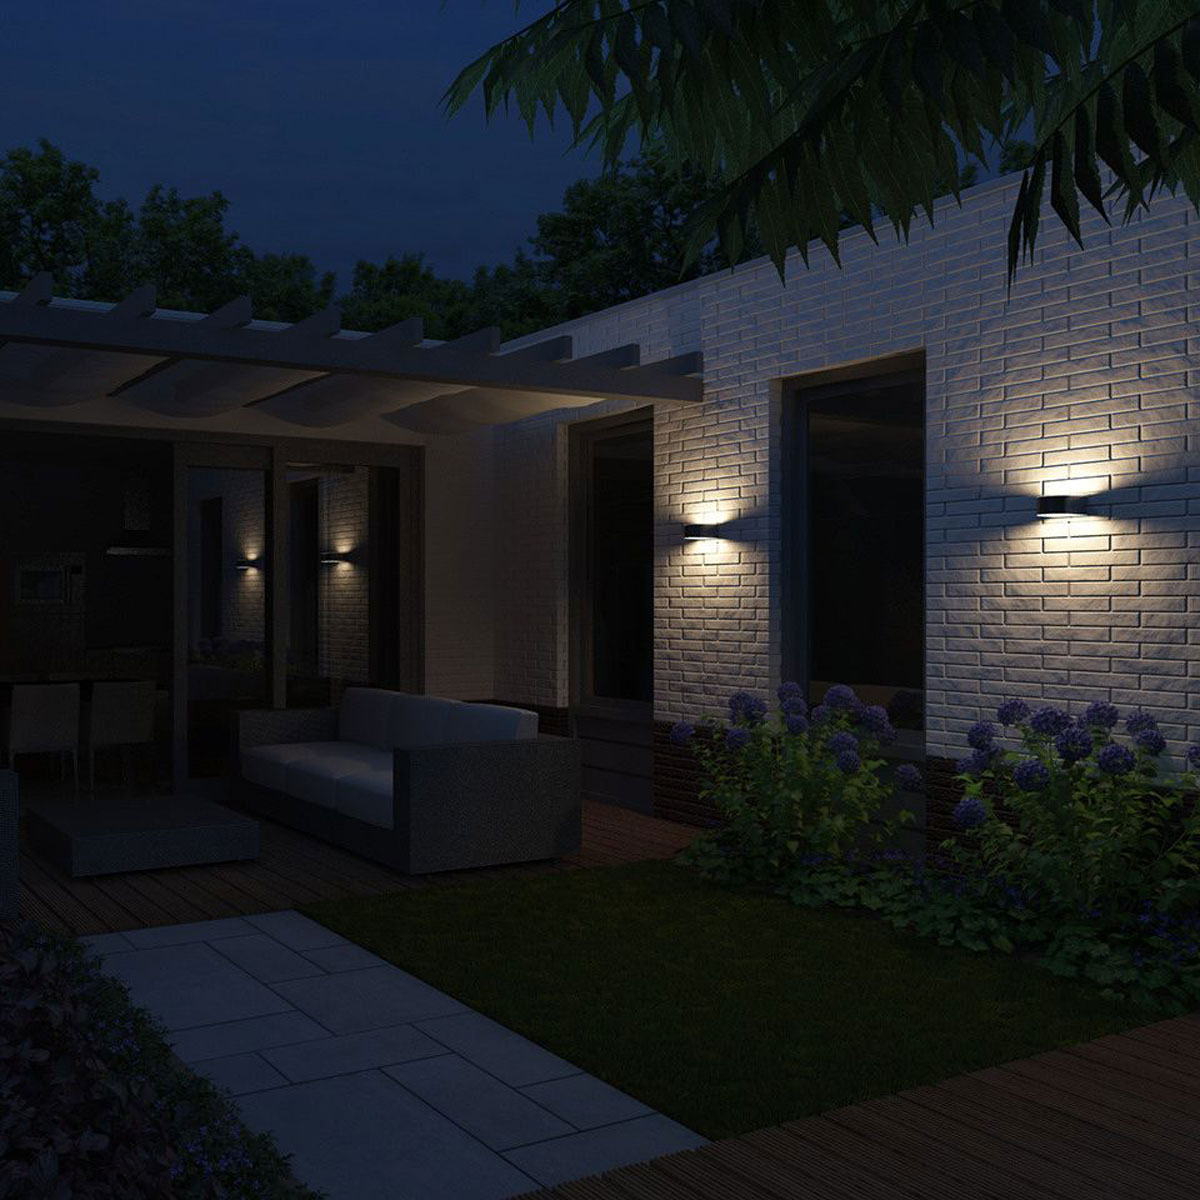 philips mygarden picnic wandlamp rvs wit. Black Bedroom Furniture Sets. Home Design Ideas